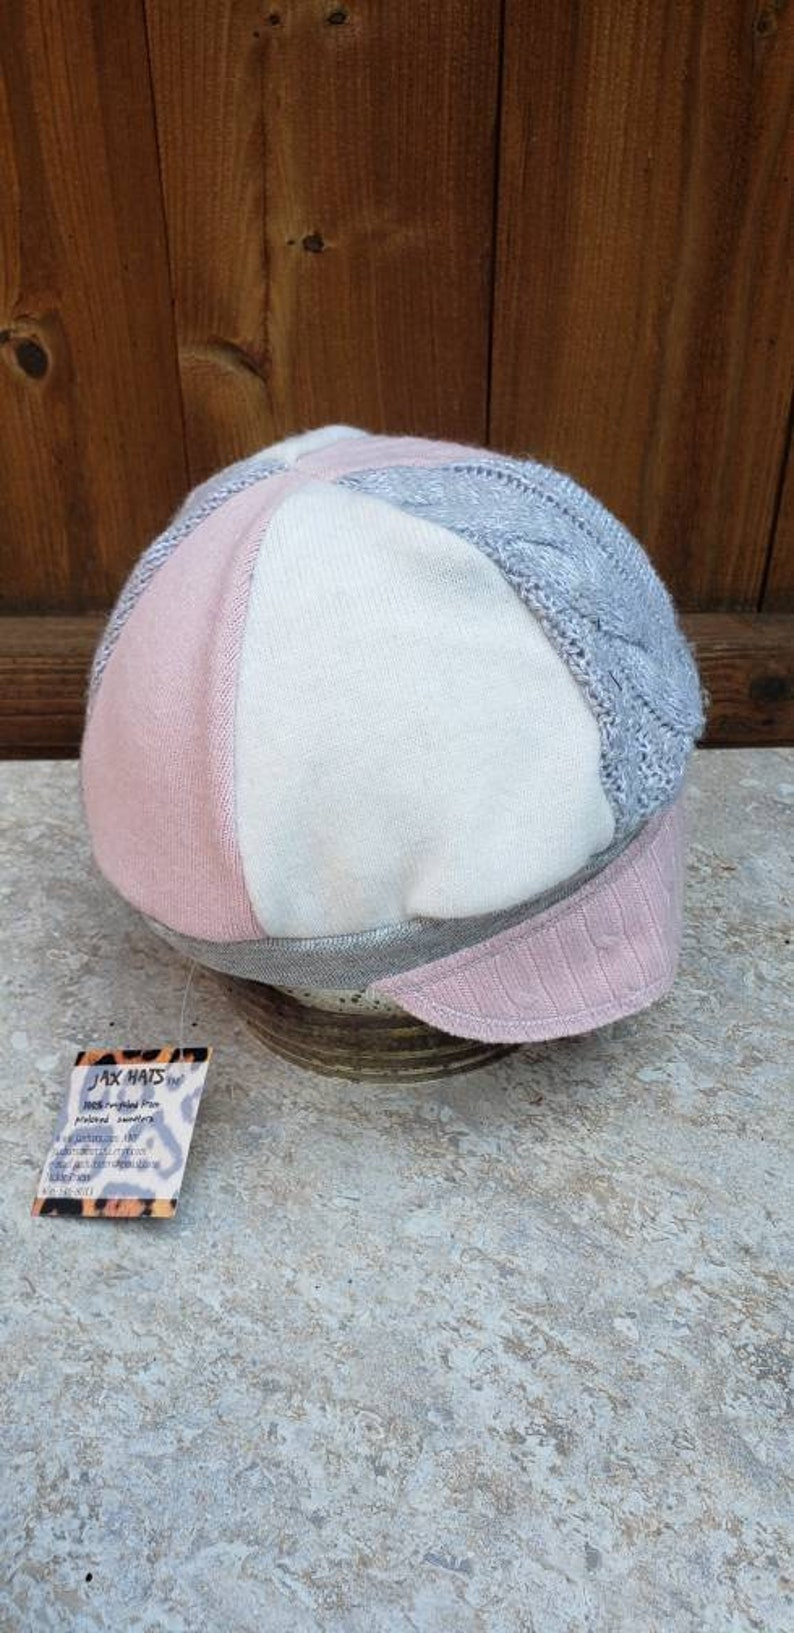 mixed fabrics hat photo prop Jax Hat Child size chemo alopecia cap pinkgrey hat upcycled cap upcycled sweater hat girl Montana